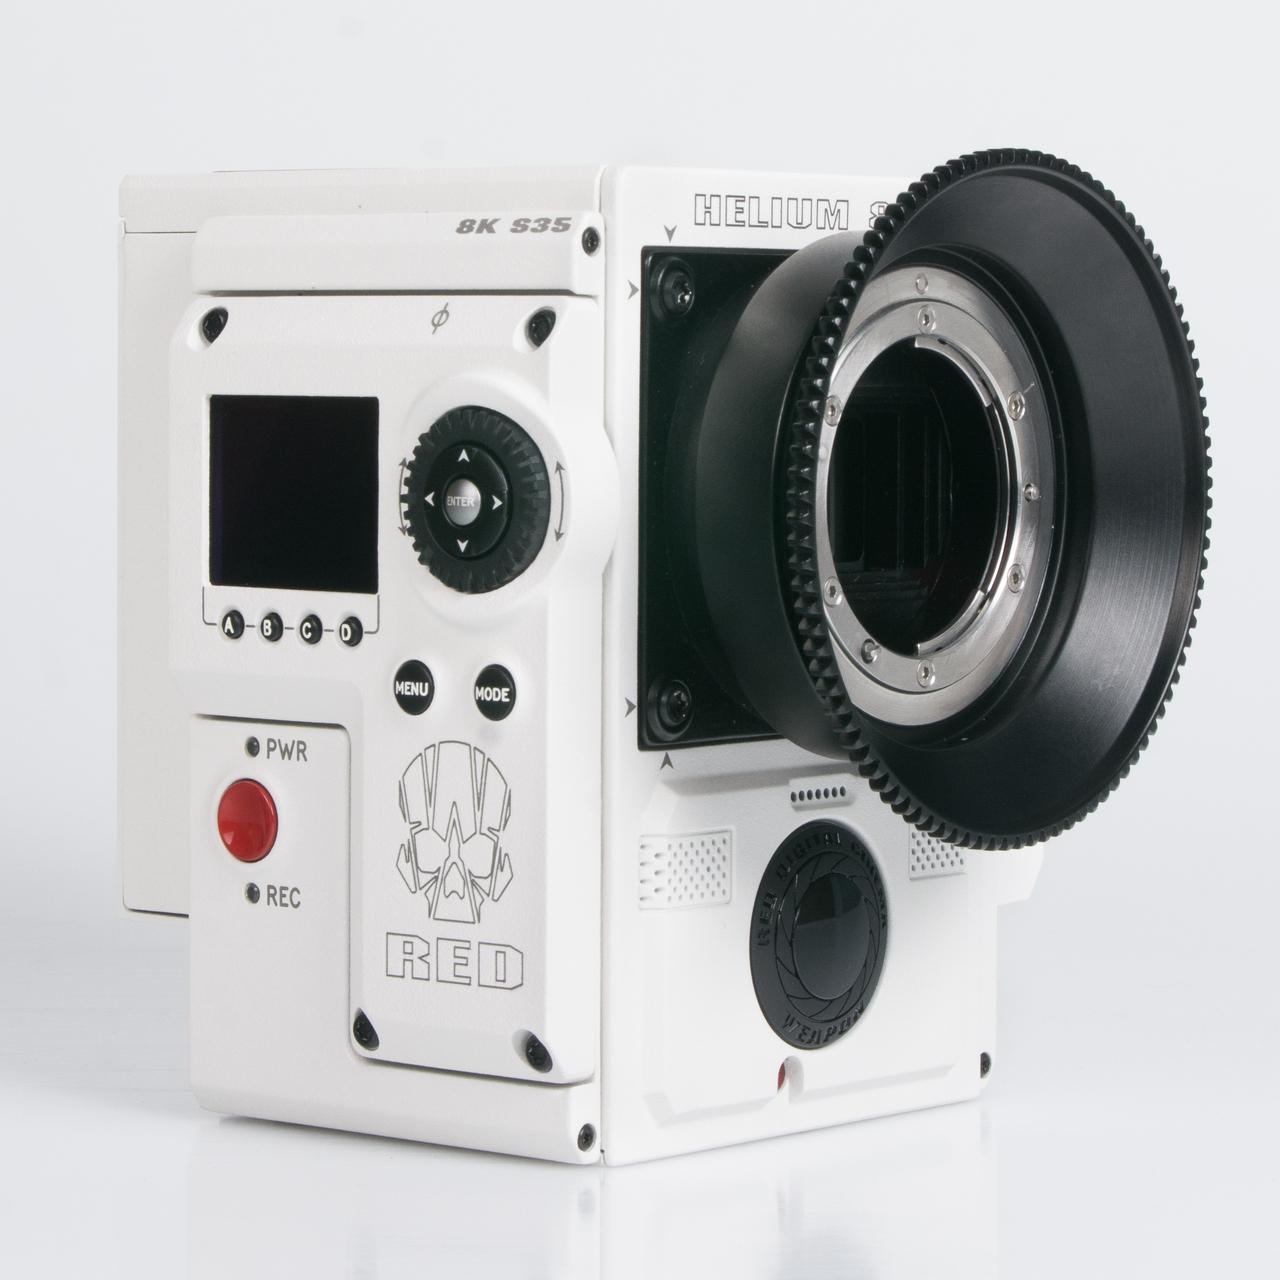 16409 N120 Adaptor for Nikon-R UW Nikonos RS Lenses with RED DSMC Lens Mount